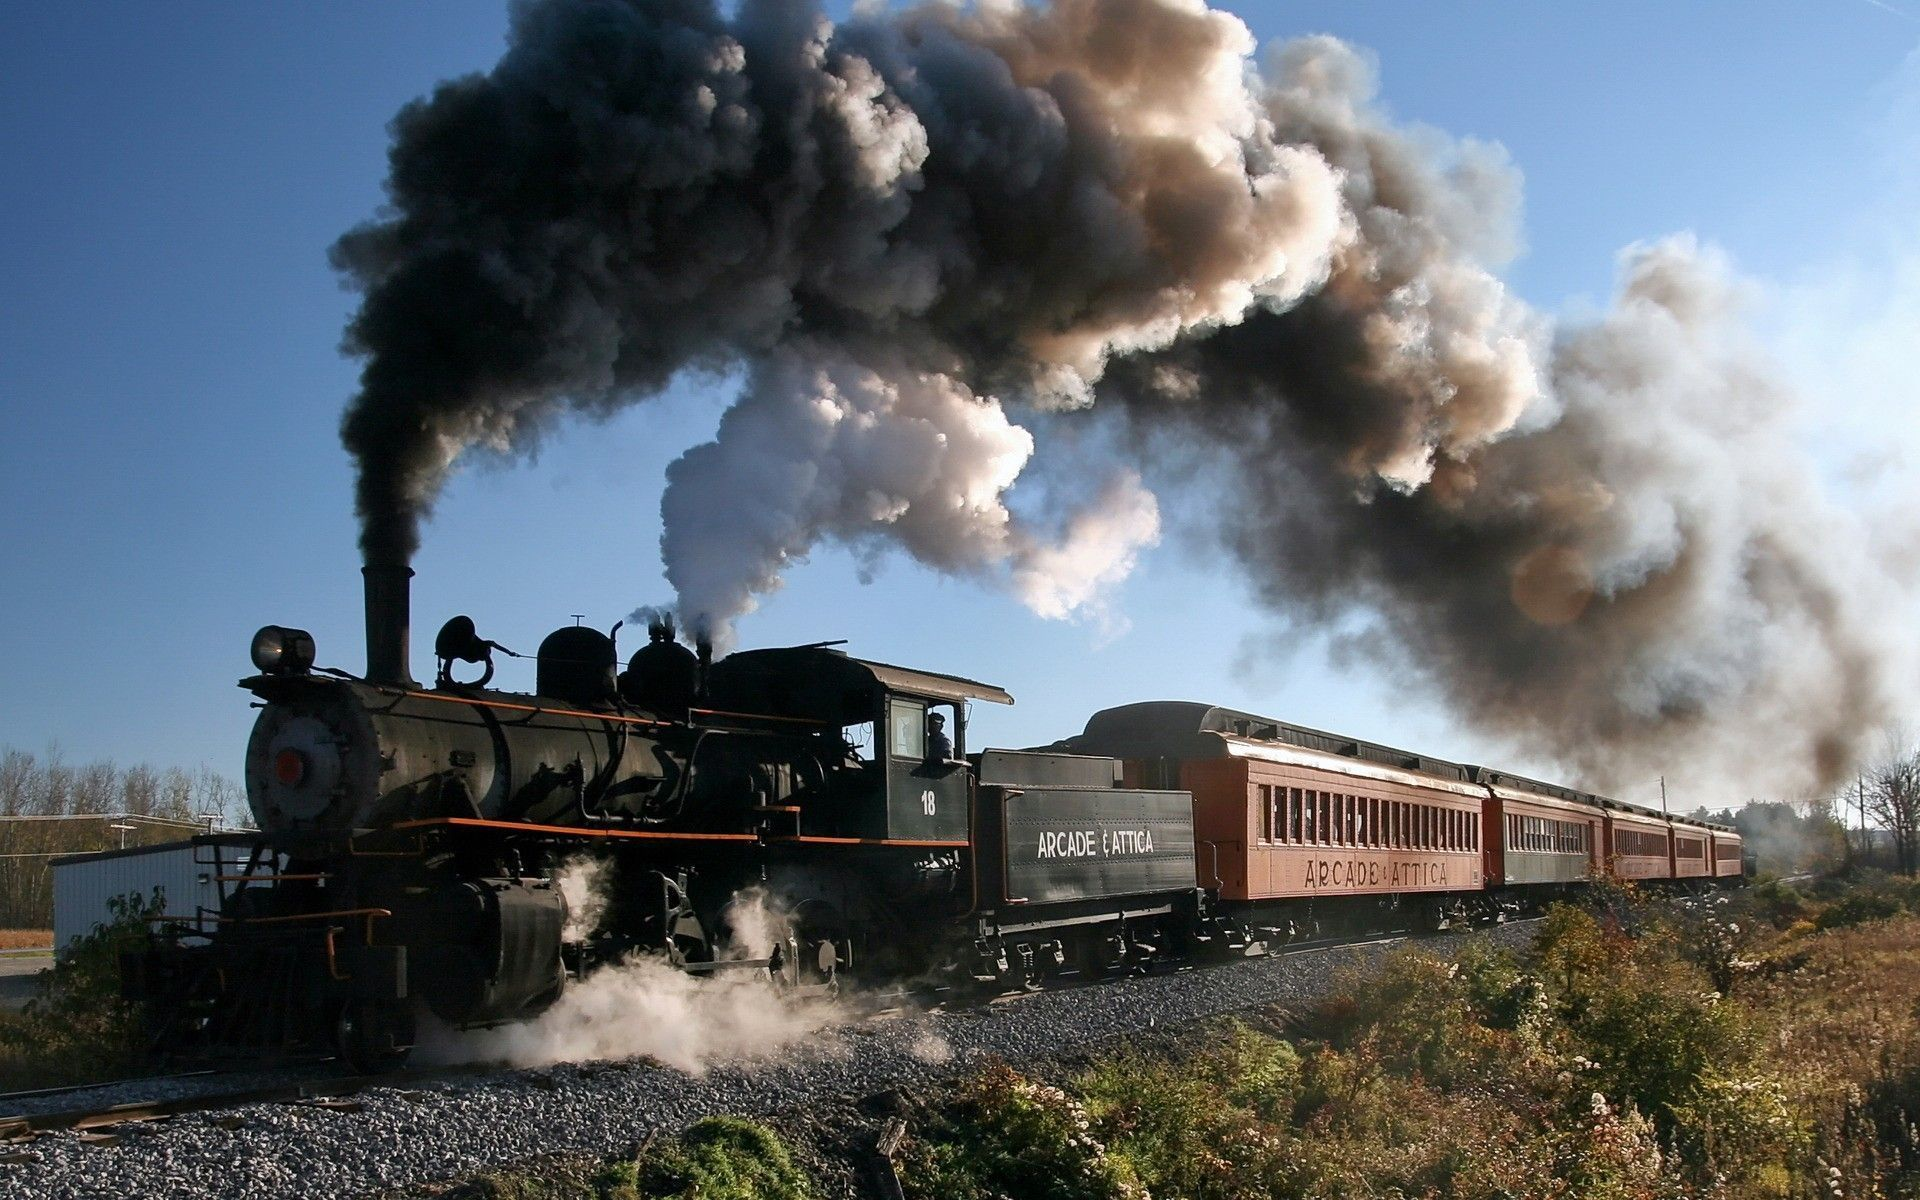 Steam train wallpaper Full View and Download Steam Train